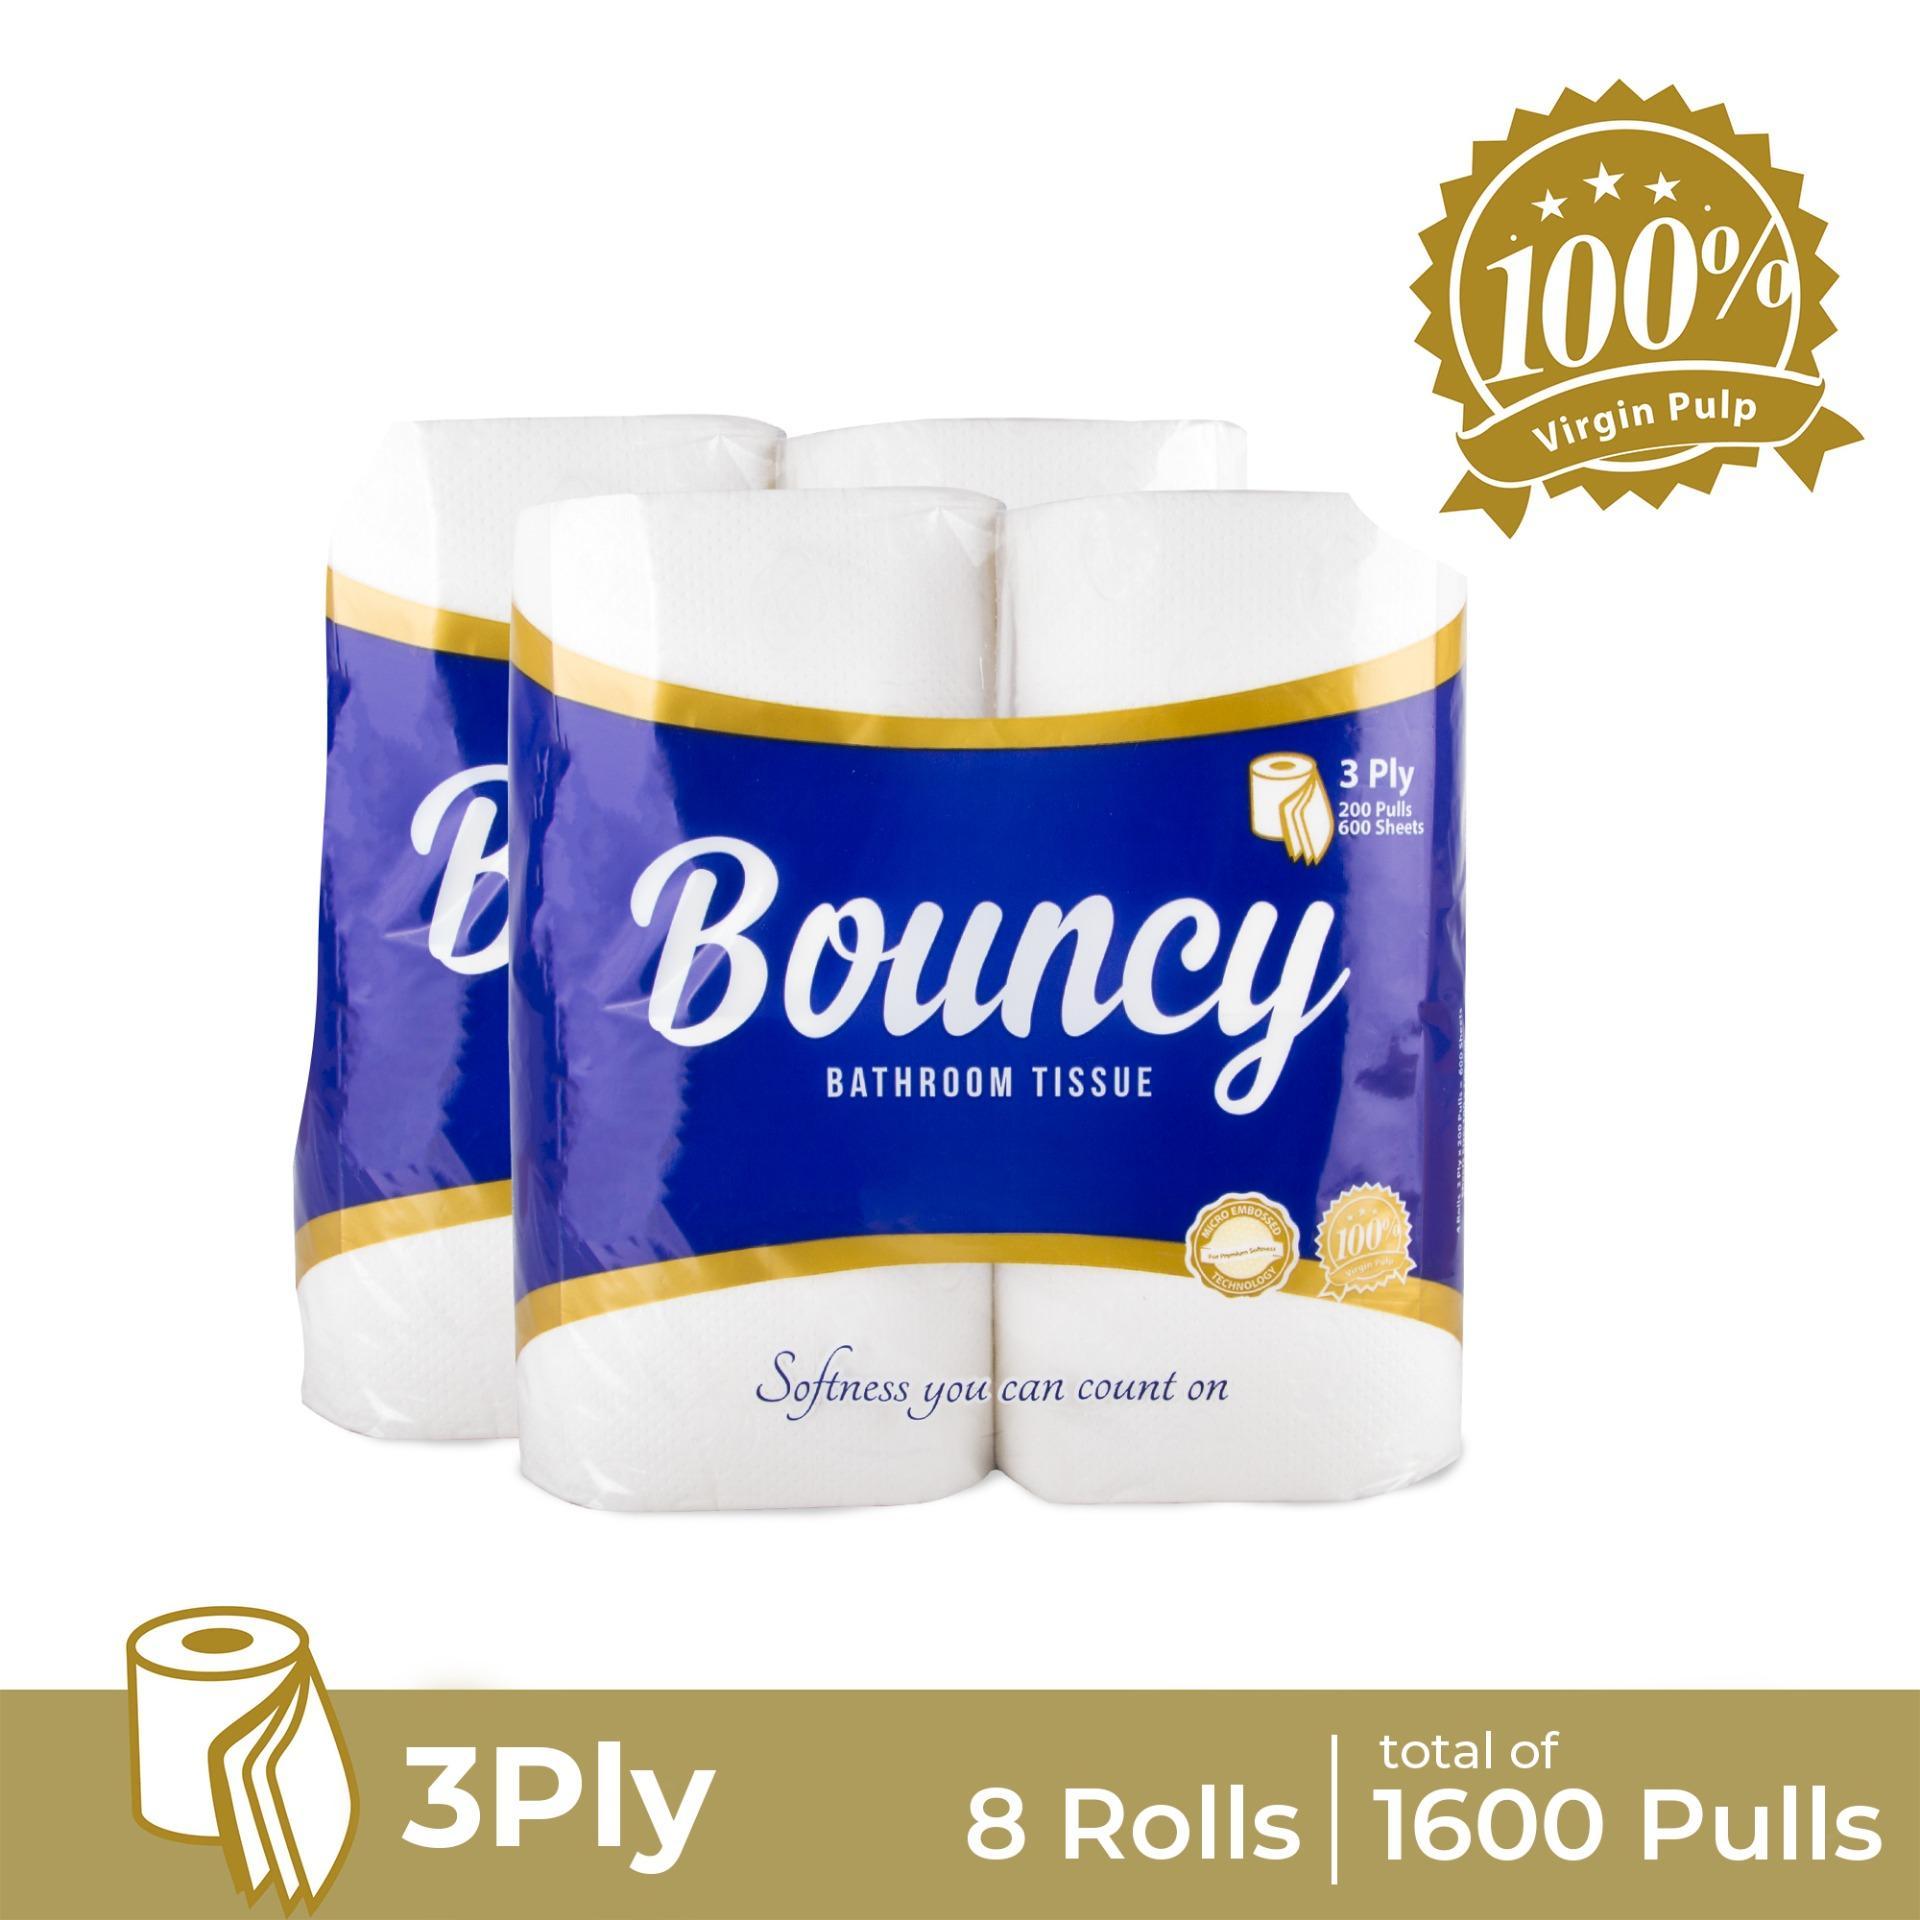 Bouncy Bathroom Tissue 3ply 200 Pulls X